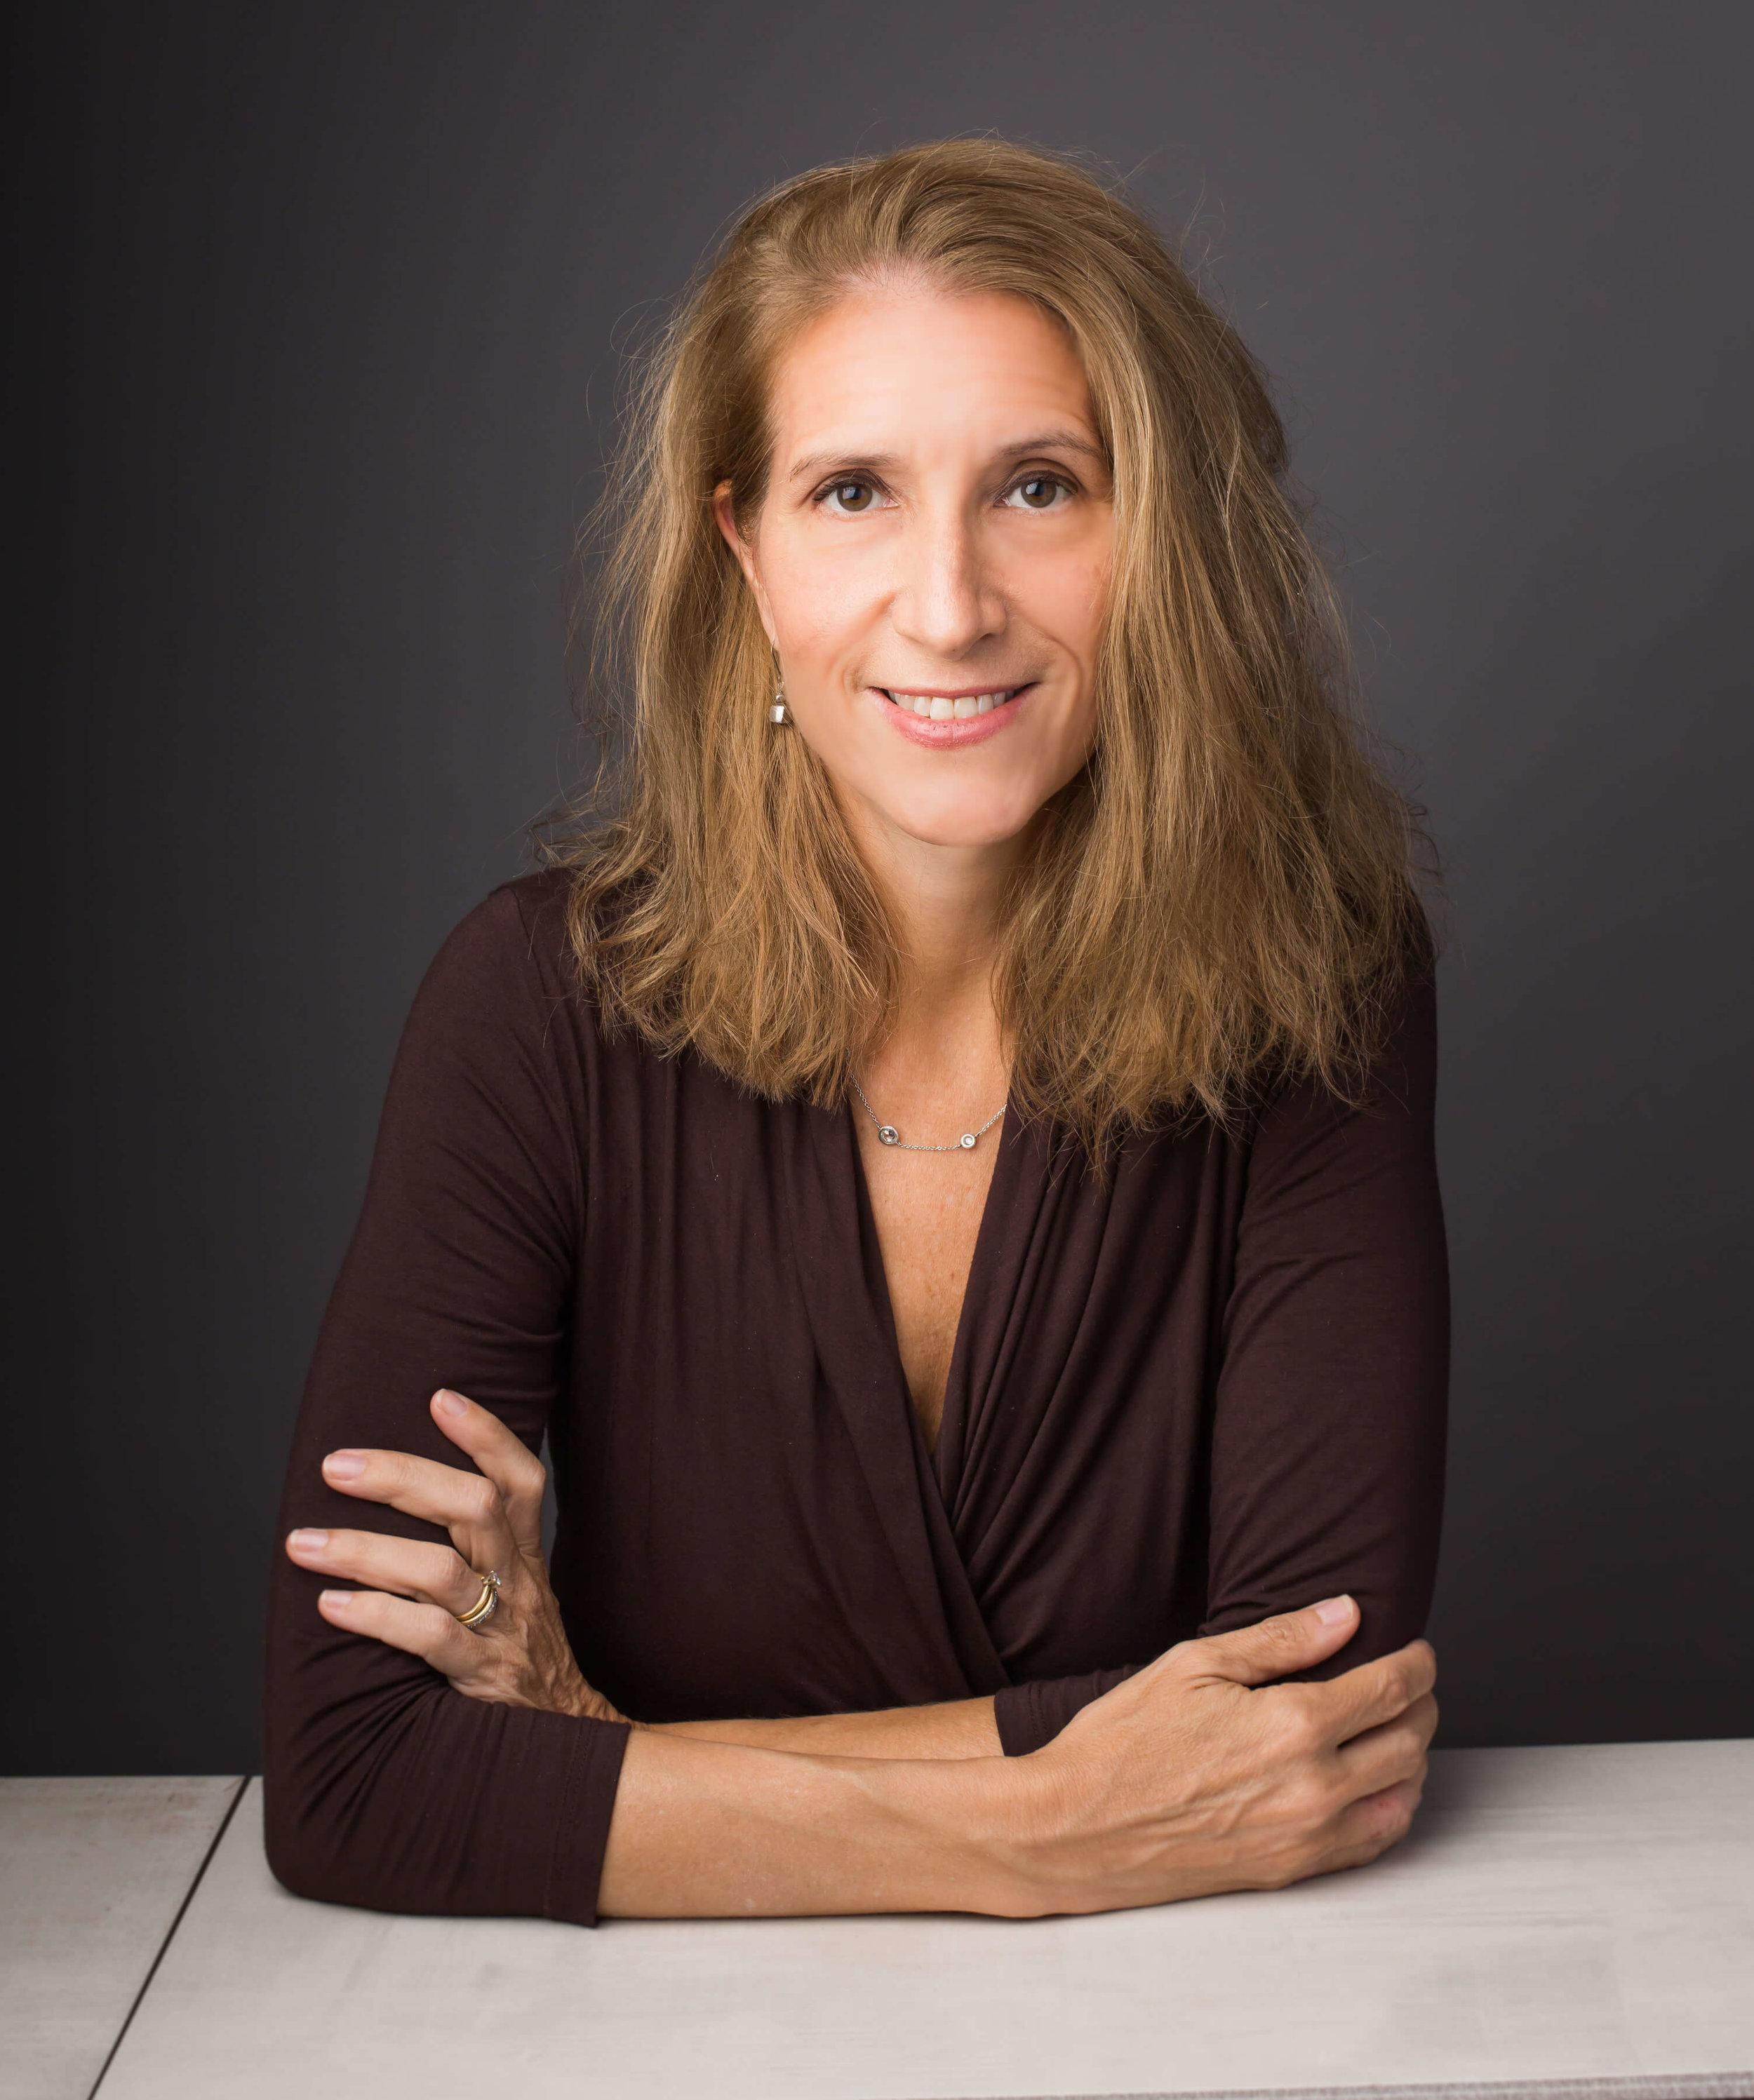 Catherine Sanderson | Speaker, Professor, Author